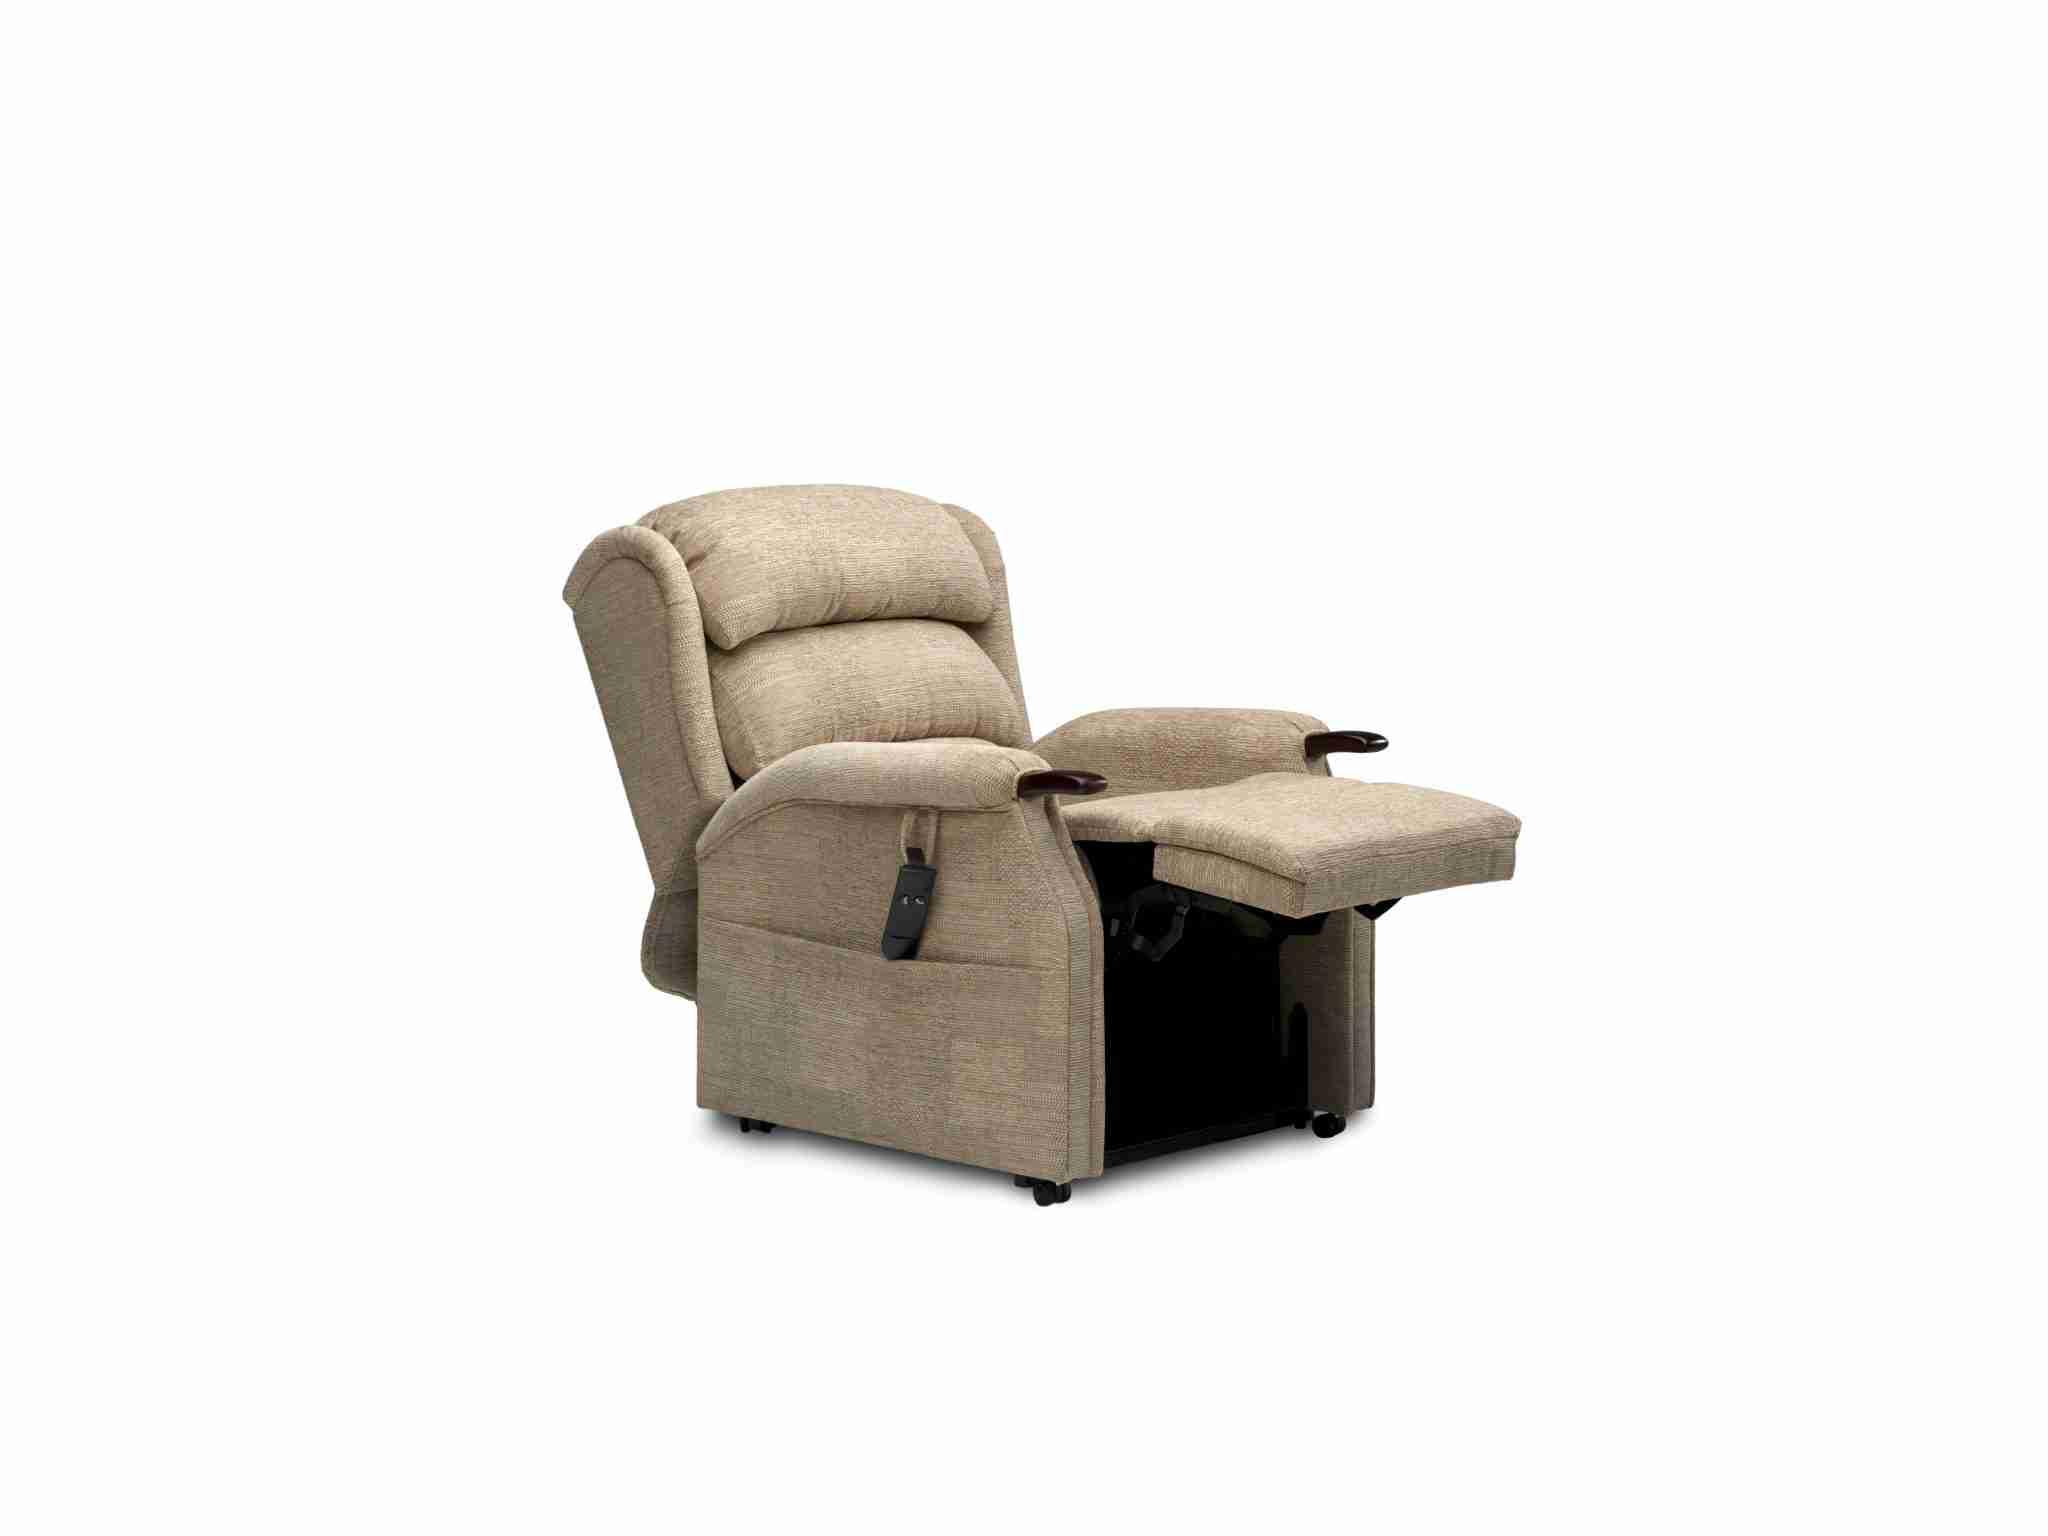 Rimini Chair WA Repose004